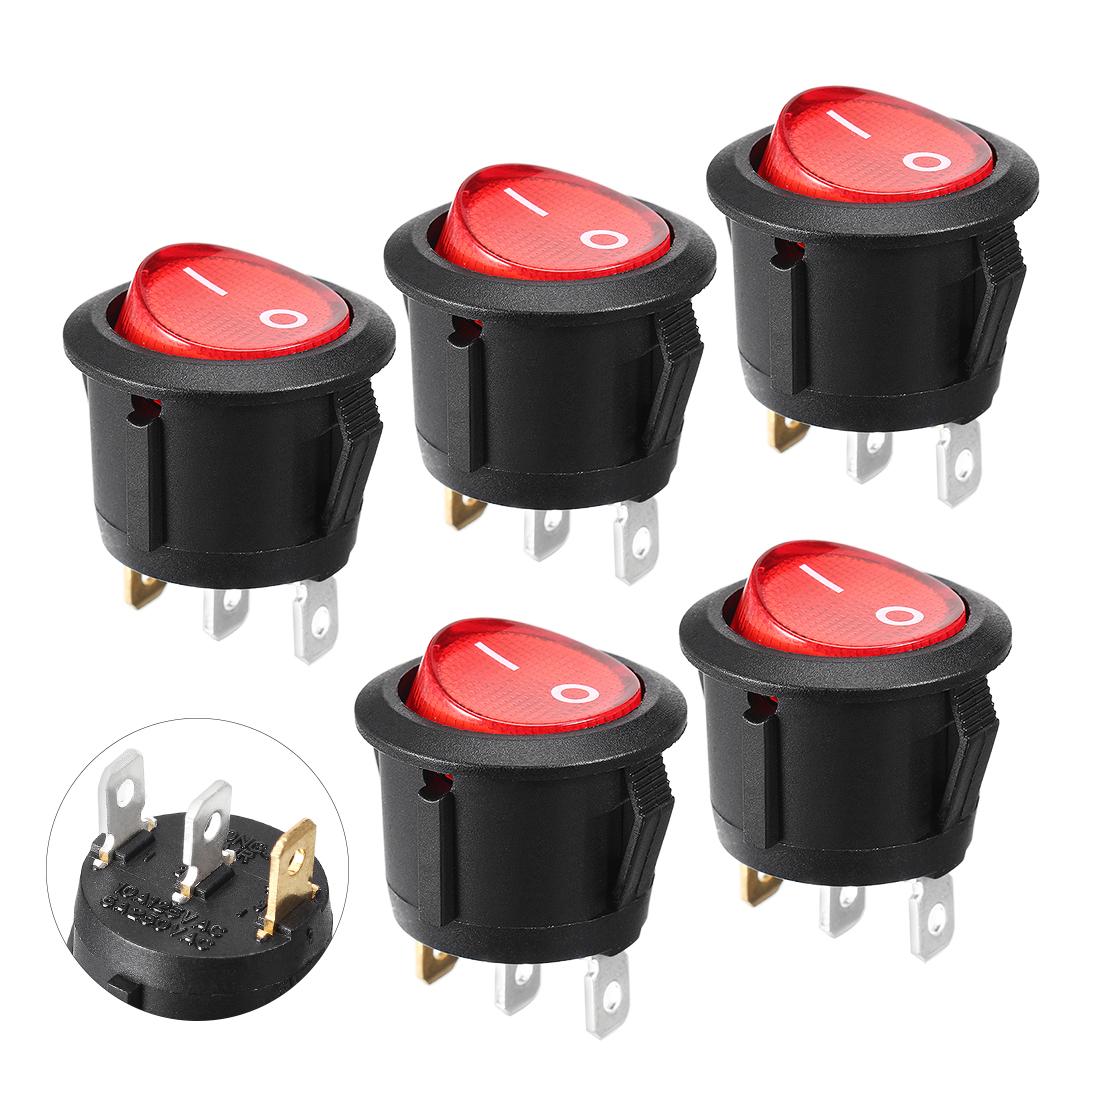 5PCS Round Red Lamp 3 Pins SPST Boat Rocker Switch AC 250V/6A 125V/10A